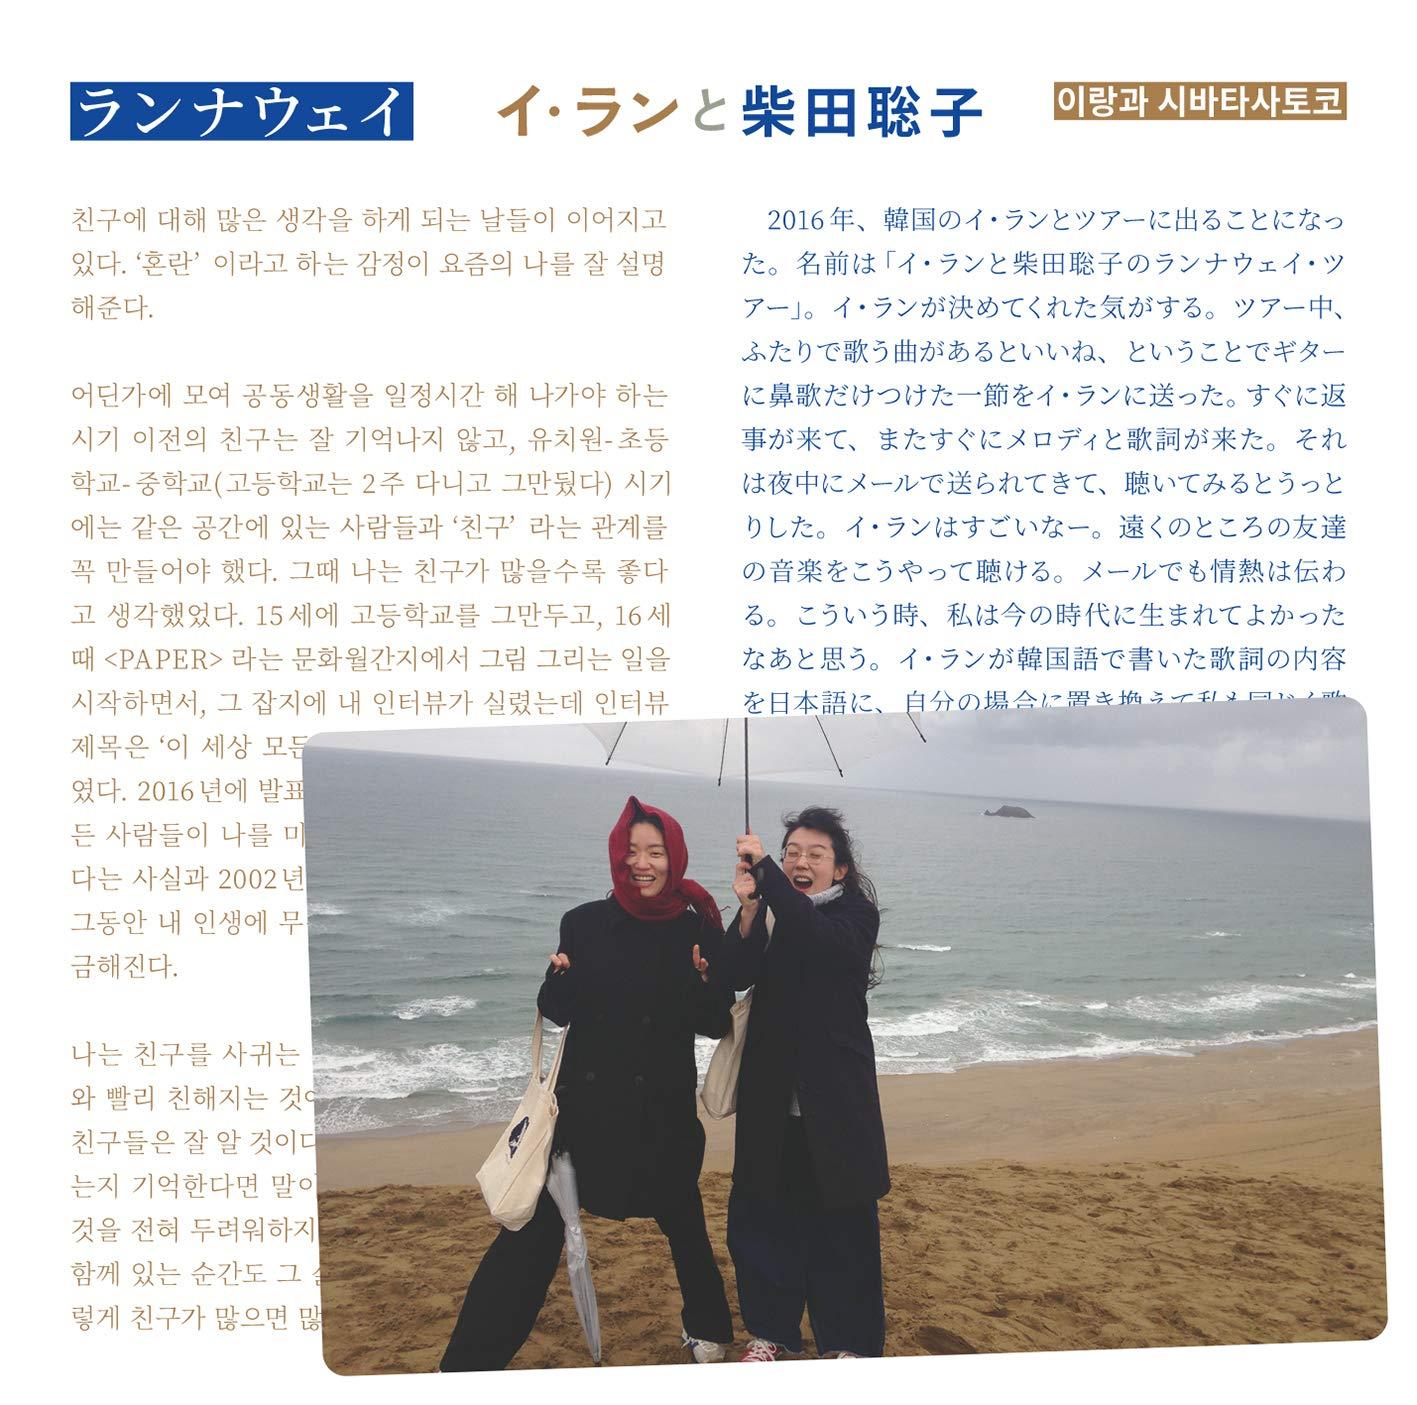 「Run Away」収録アルバム『ランナウェイ』/イ・ランと柴田聡子